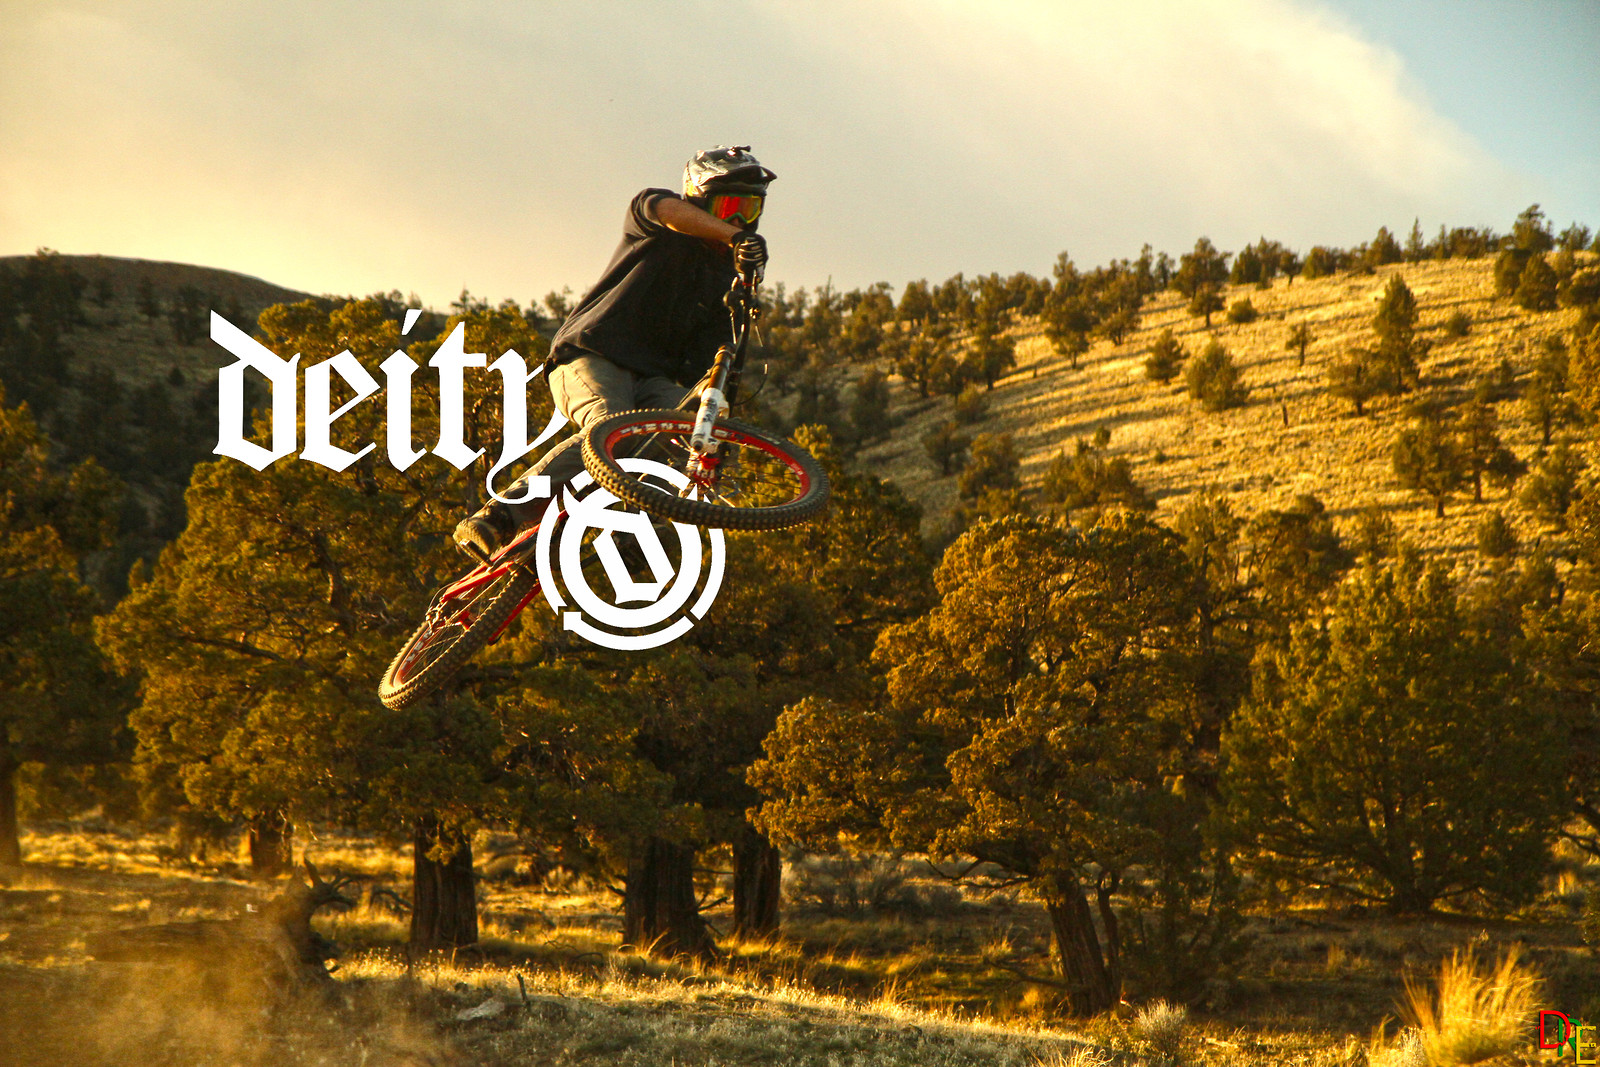 Scrubadubdub - norcalproductions - Mountain Biking Pictures - Vital MTB